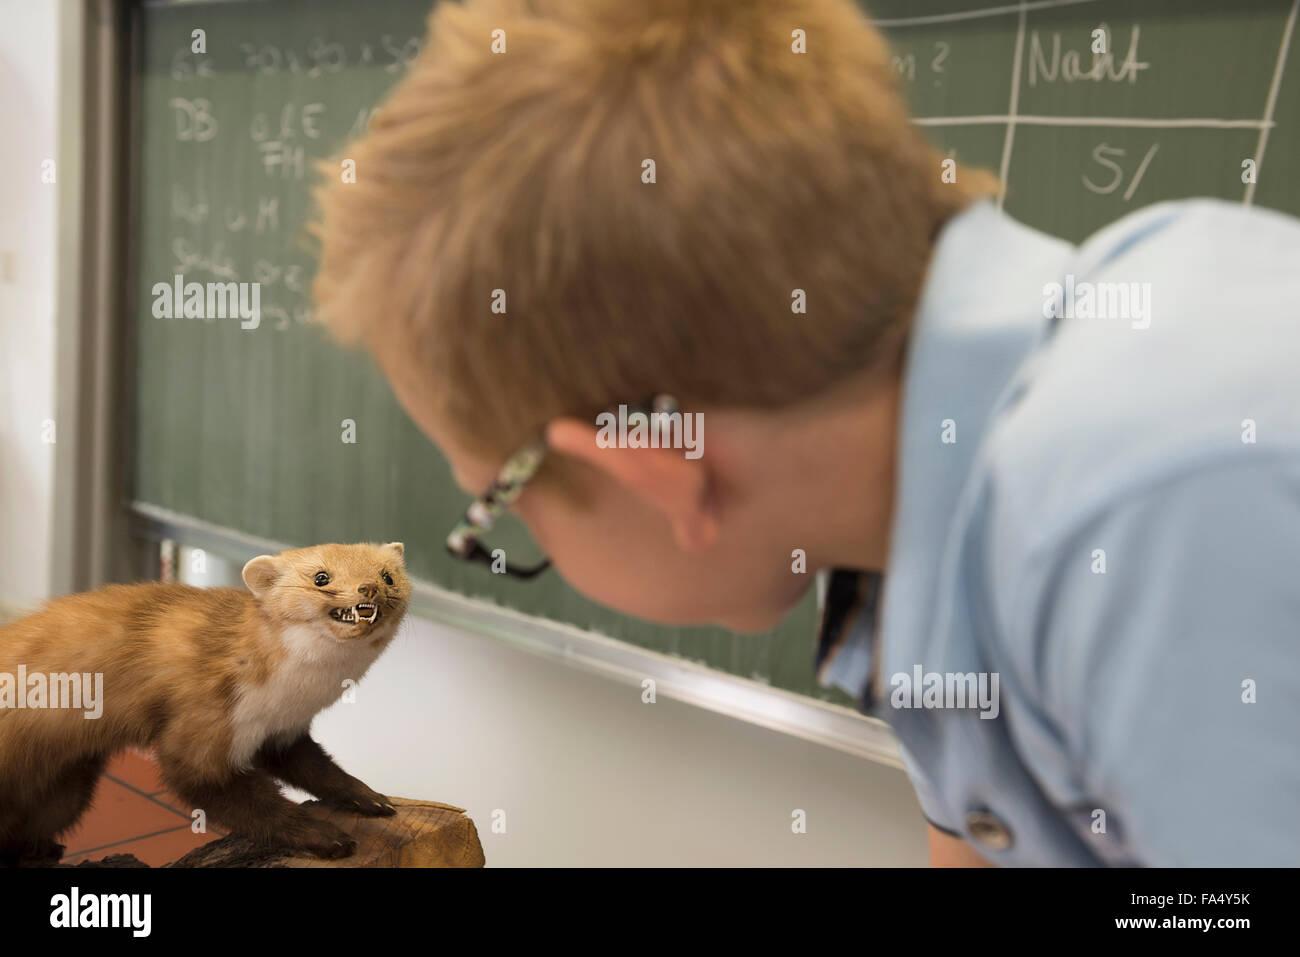 Schoolboy examining a marten in biology class, Fürstenfeldbruck, Bavaria, Germany - Stock Image